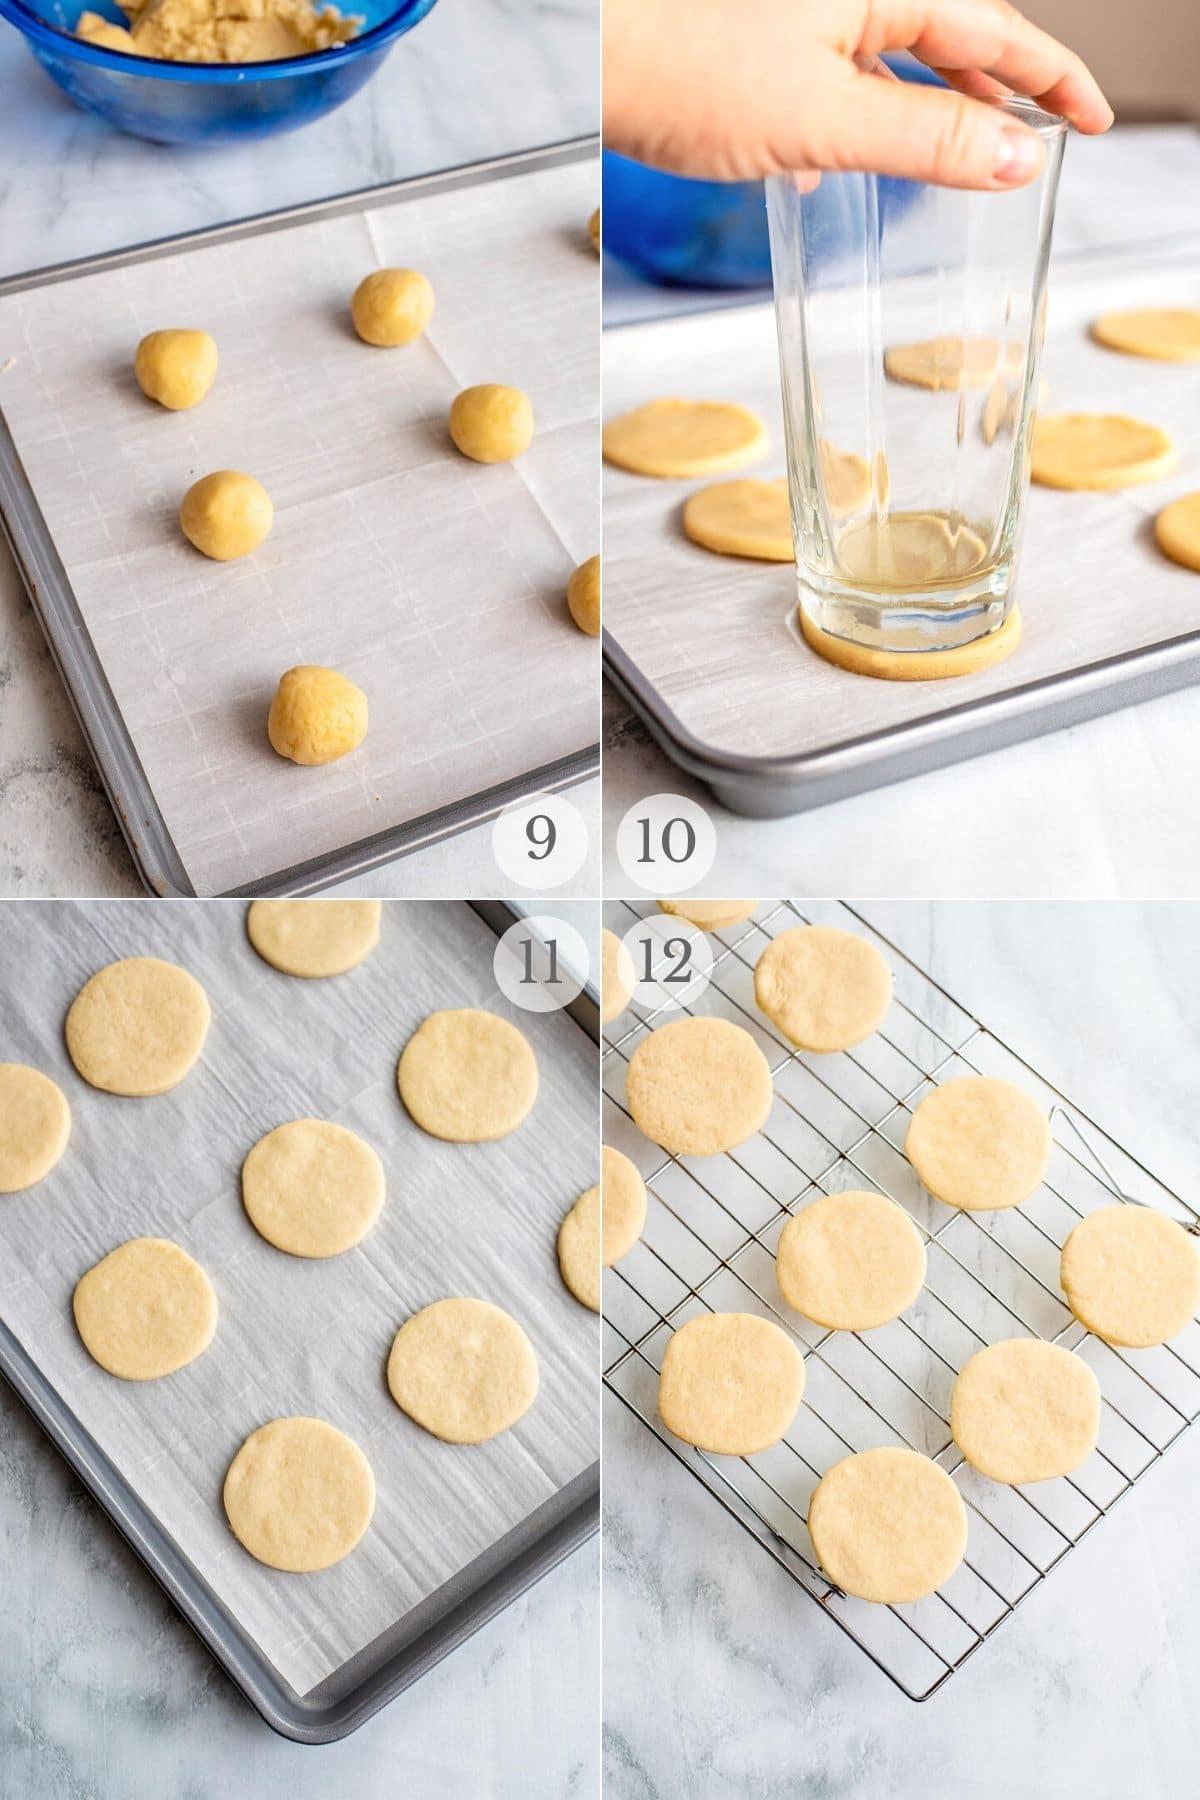 butter cookies recipe steps 9-12